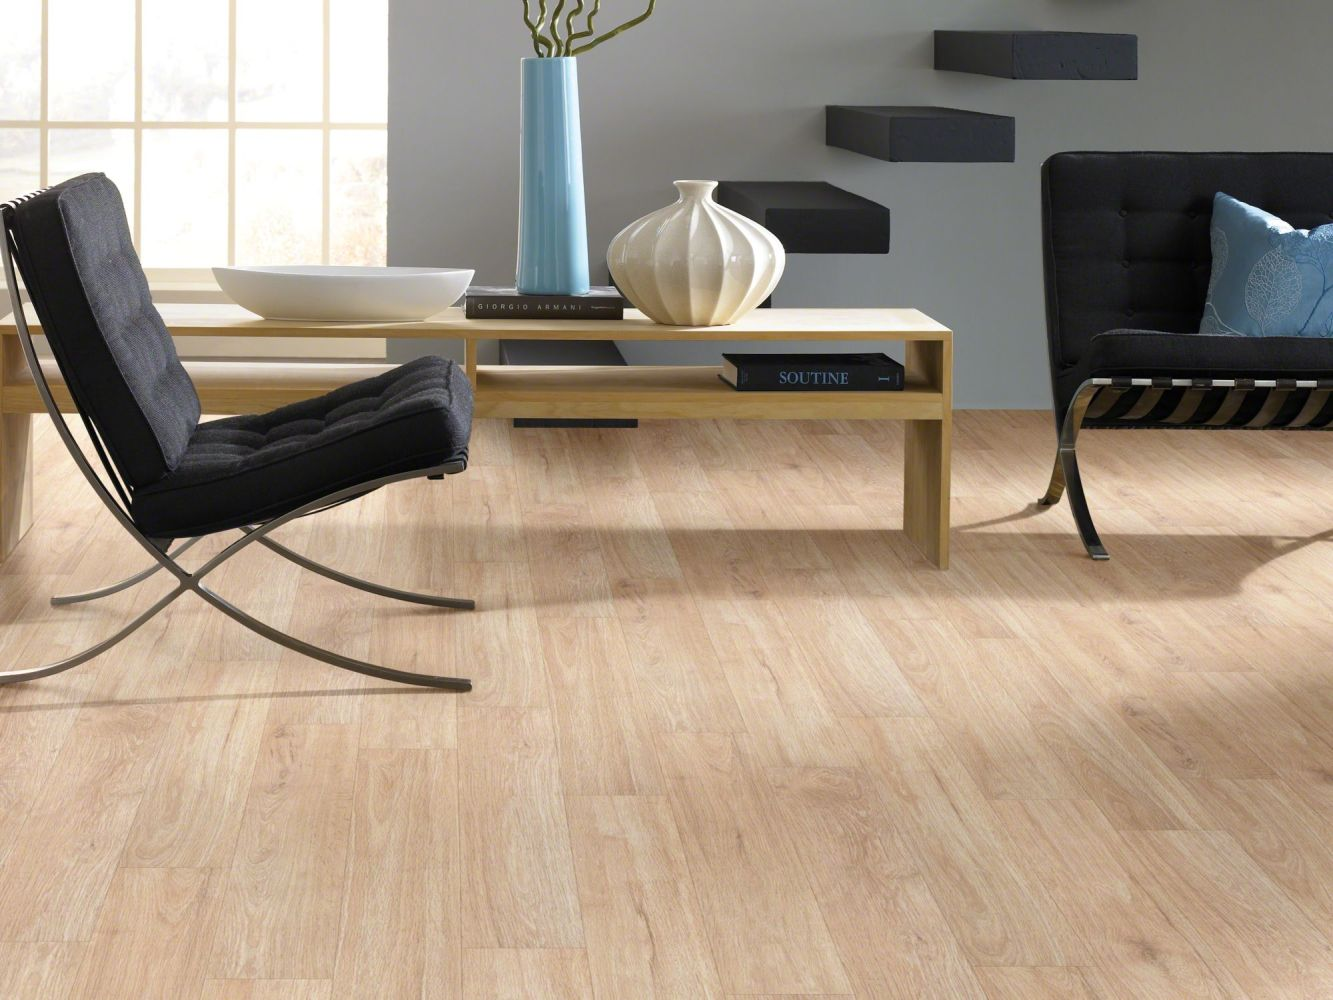 Shaw Floors Resilient Residential Urbanality 12 Plank Sidewalk 00126_0310V